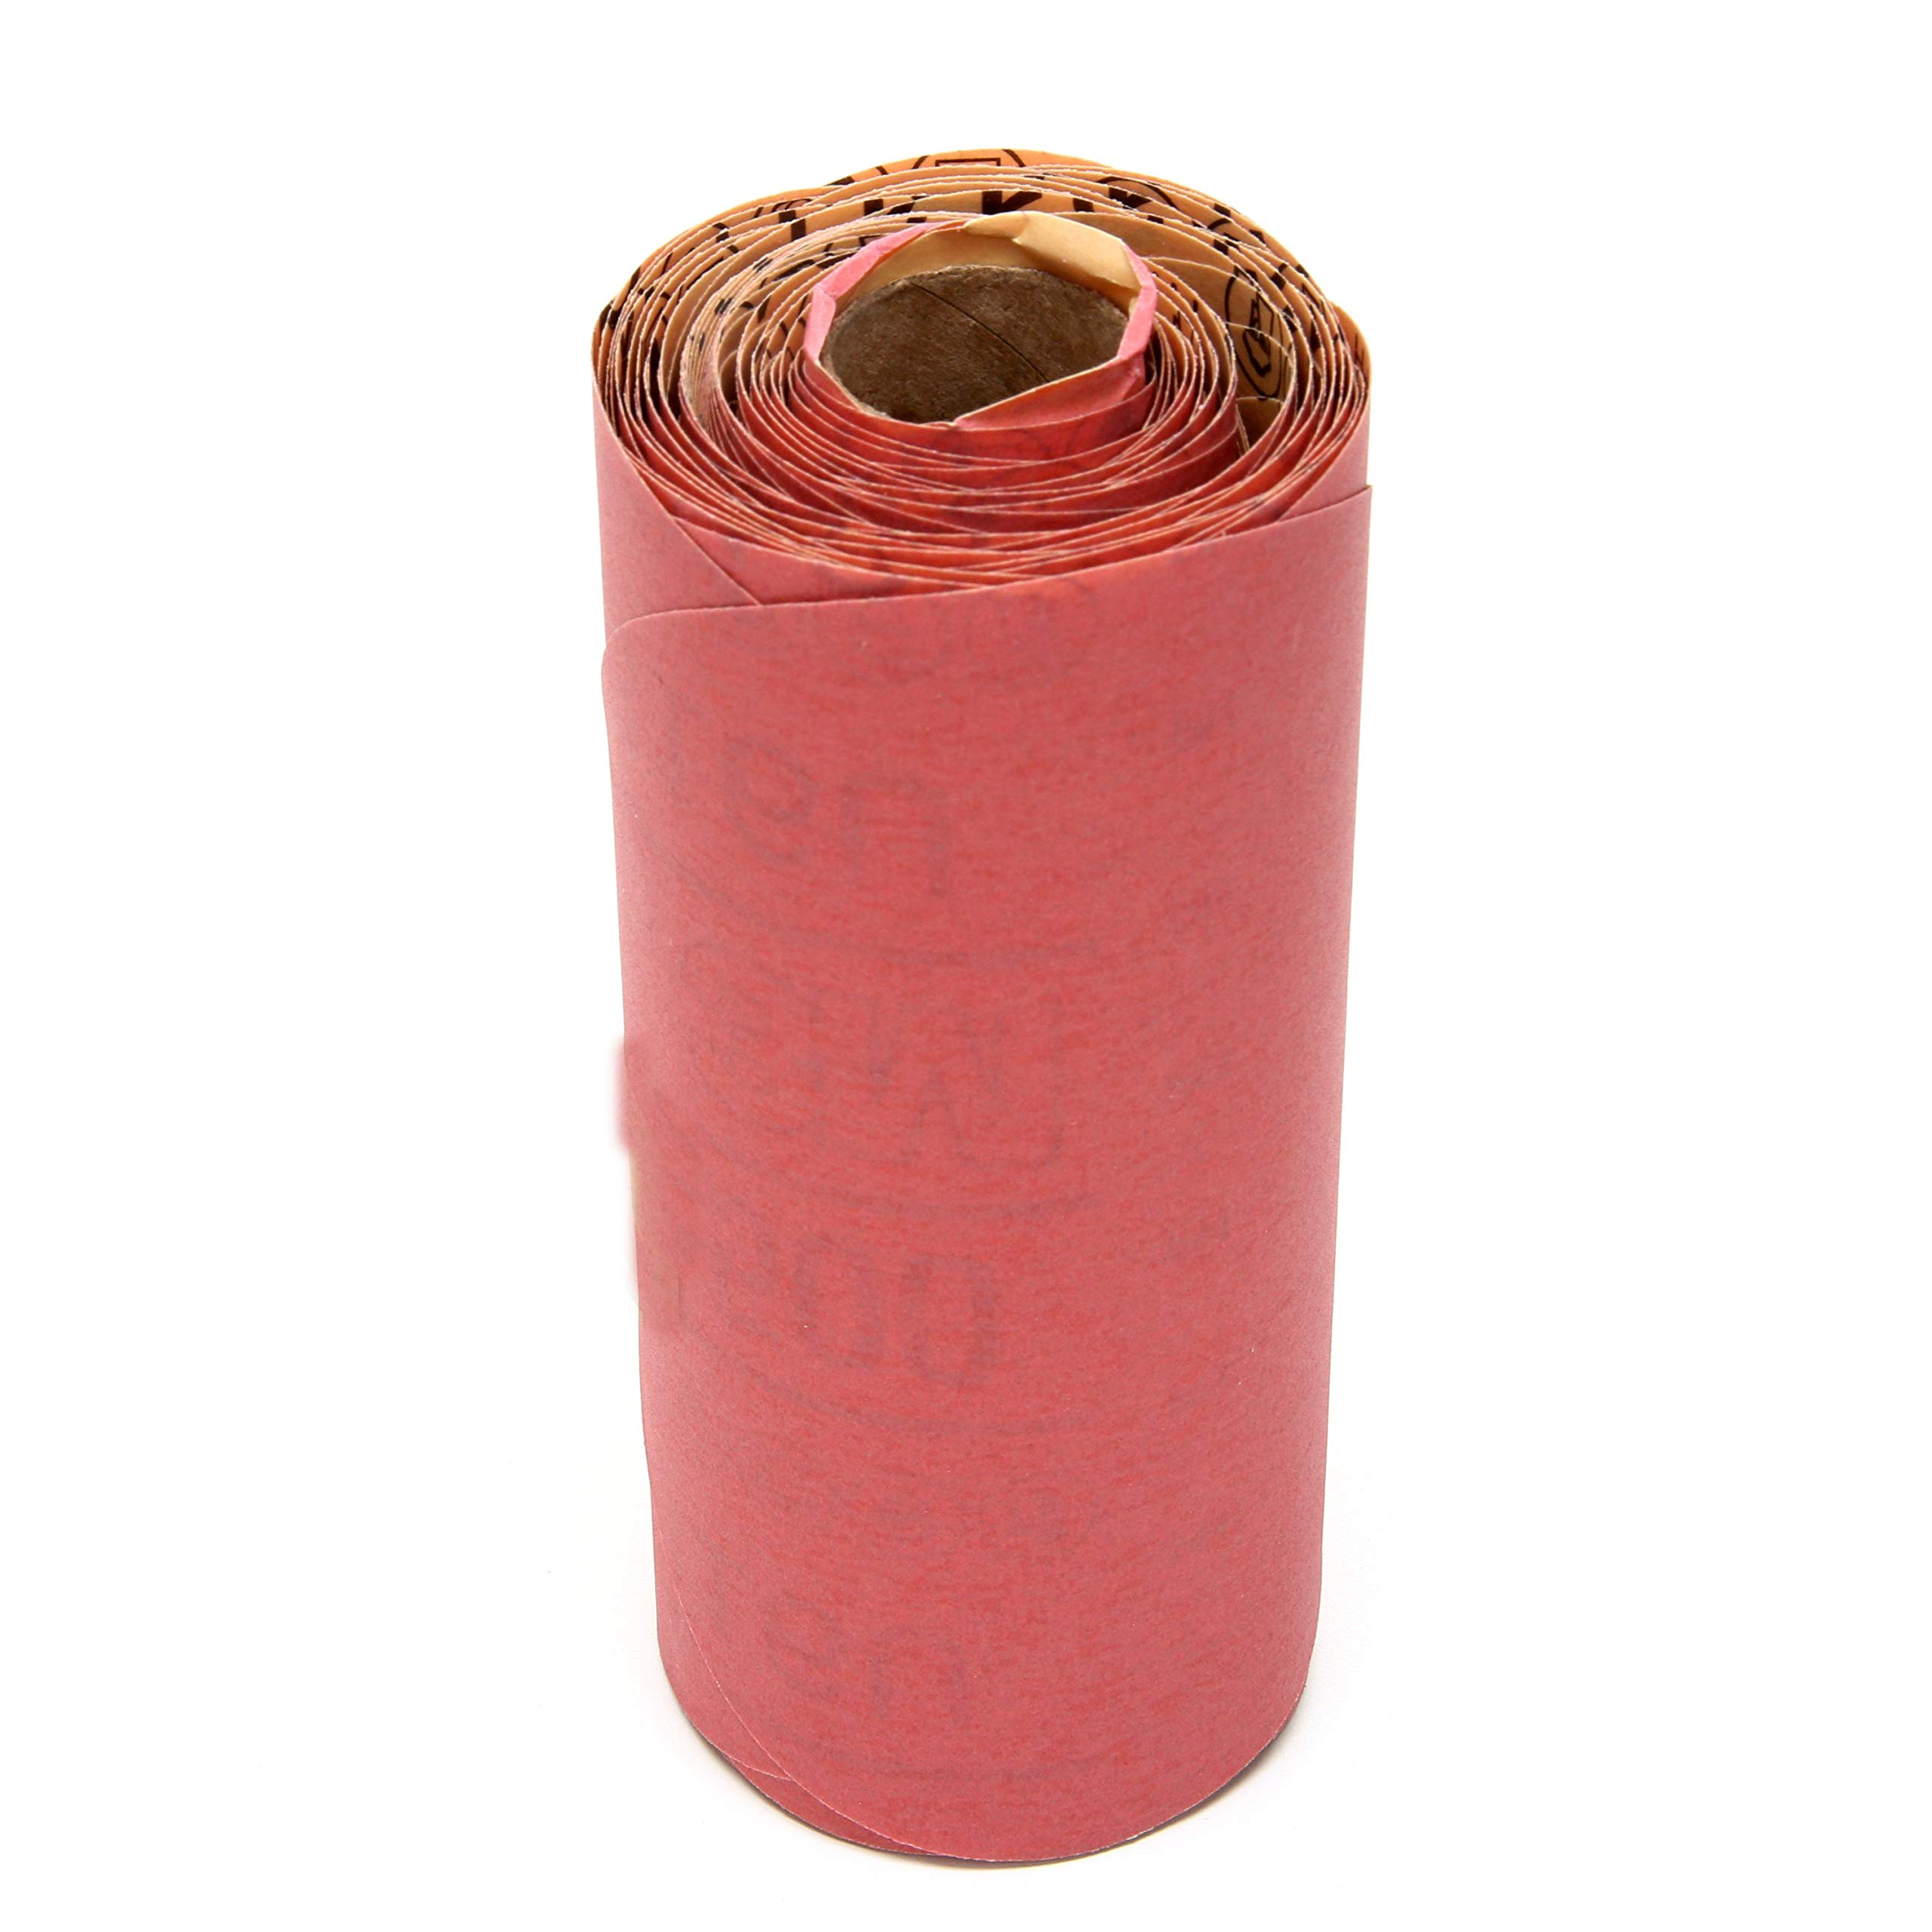 3M Red Abrasive Stikit Disc, 01107, 6 in, P500 grade, 100 discs per roll